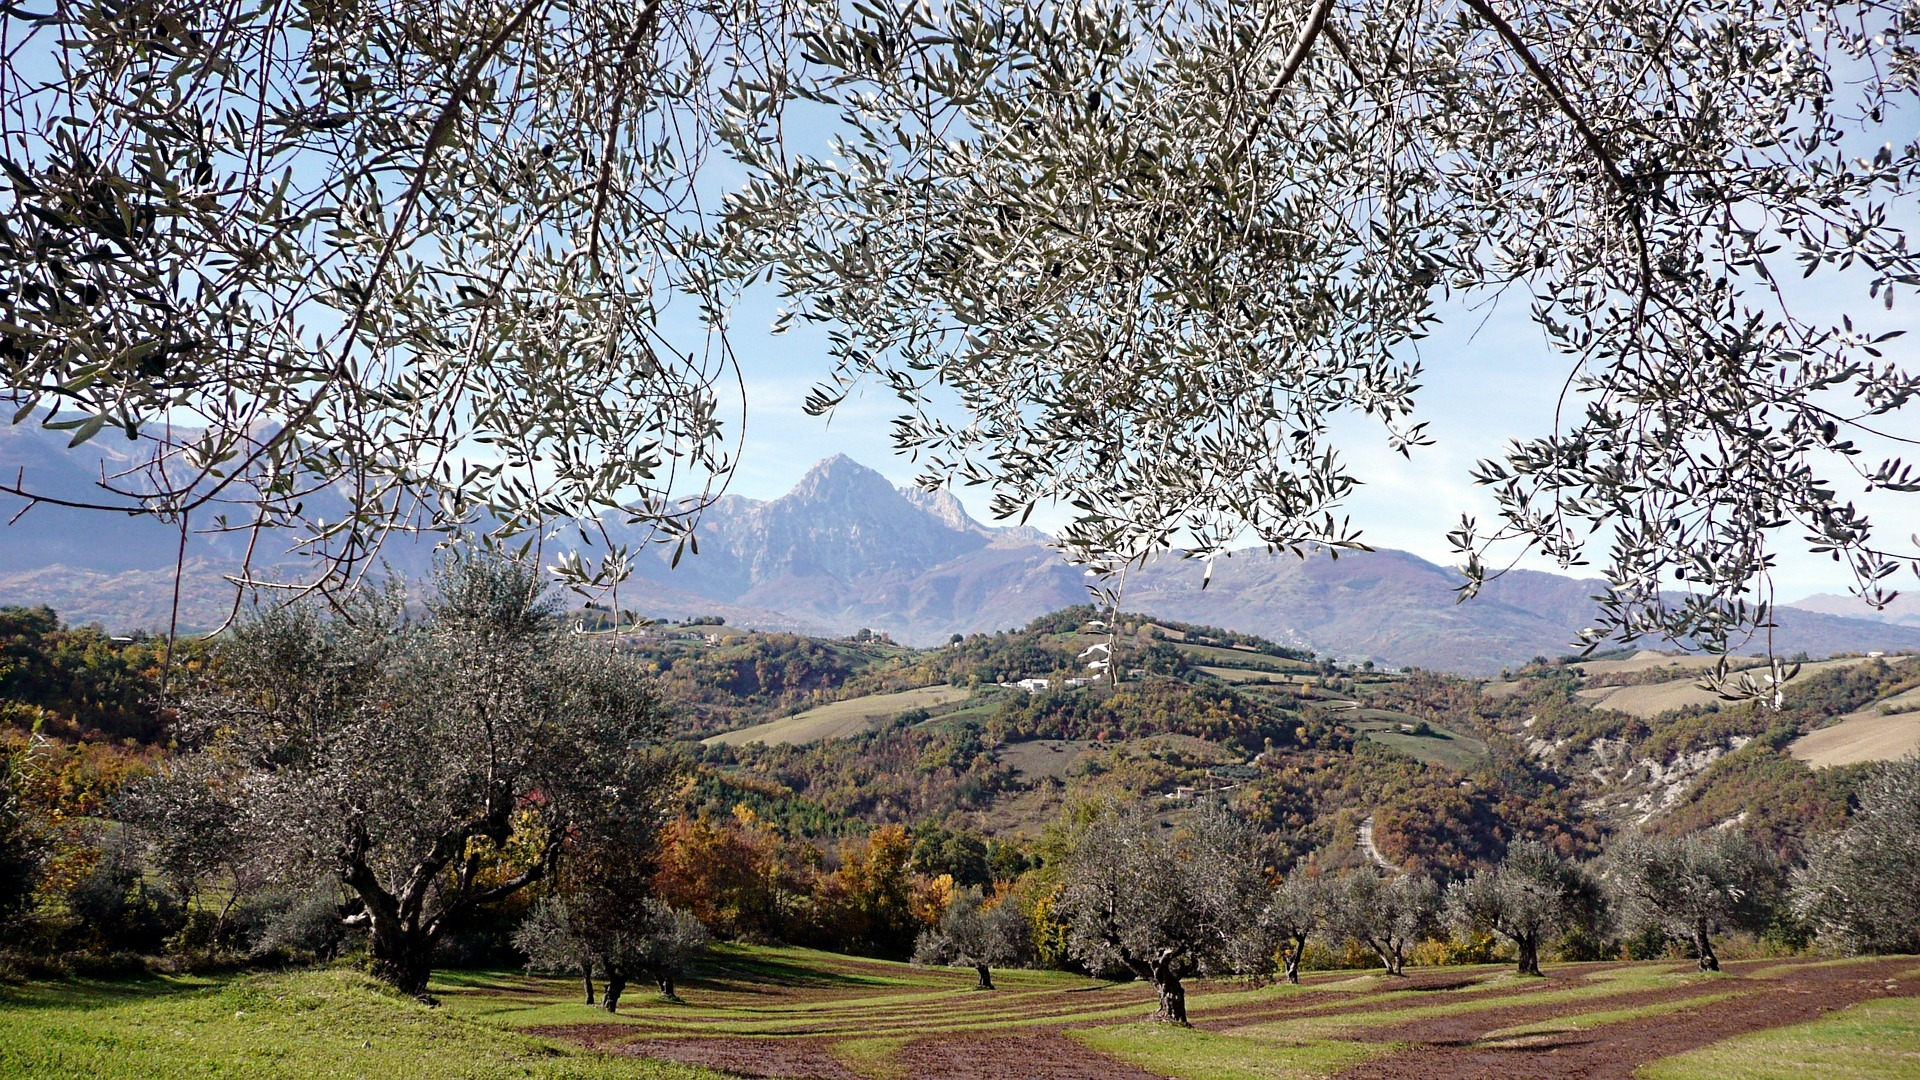 Abruzzo Natural Parks - abruzzo olive trees pix.jpg